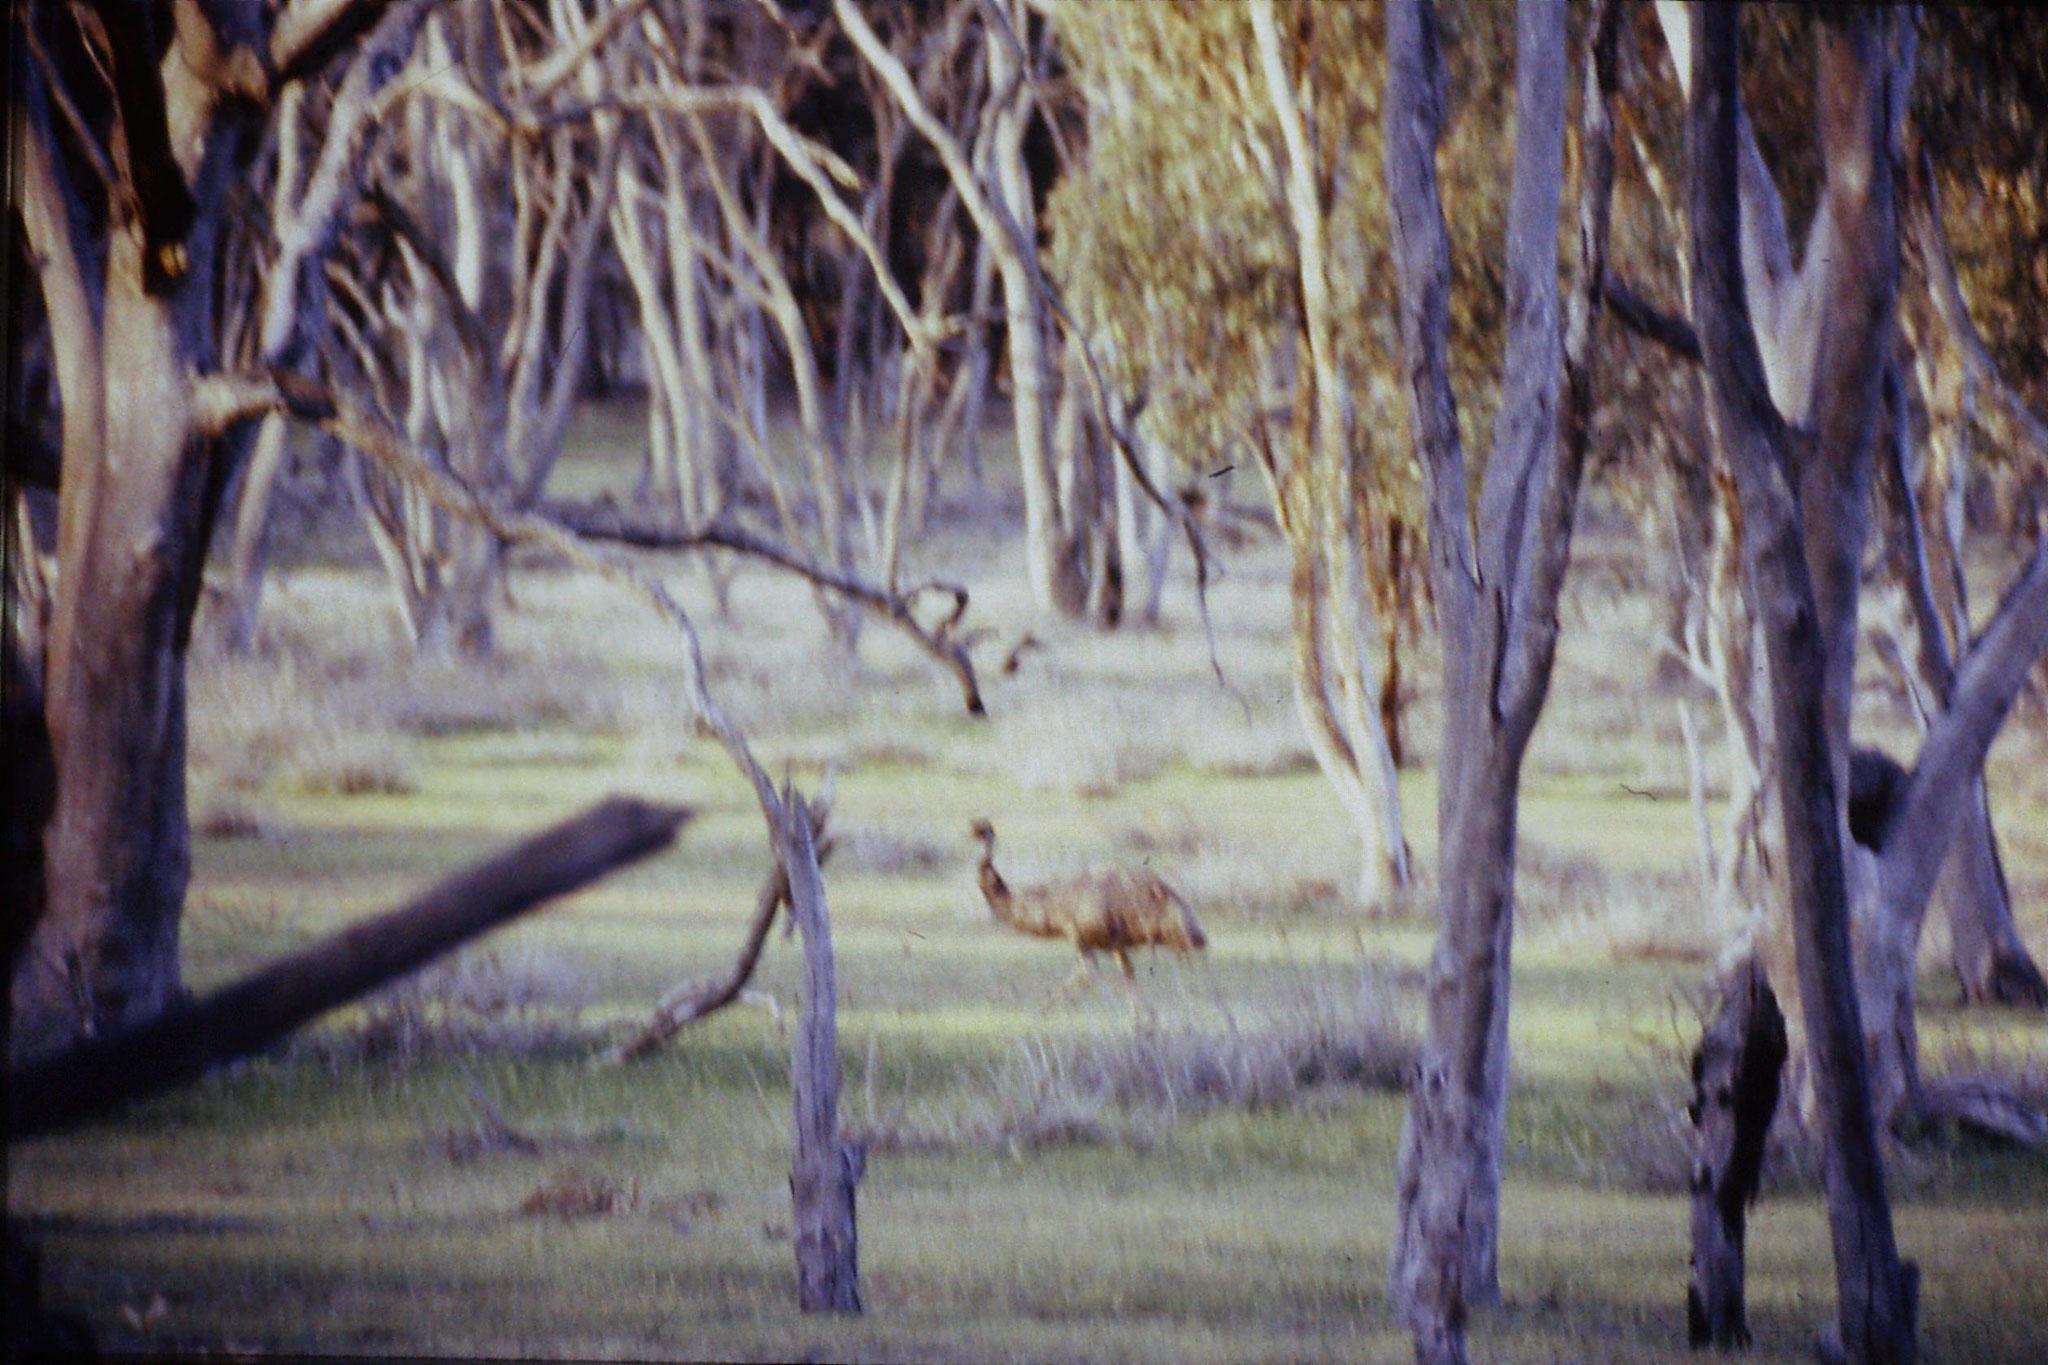 23/9/1990: 3: Wyperfeld, emu